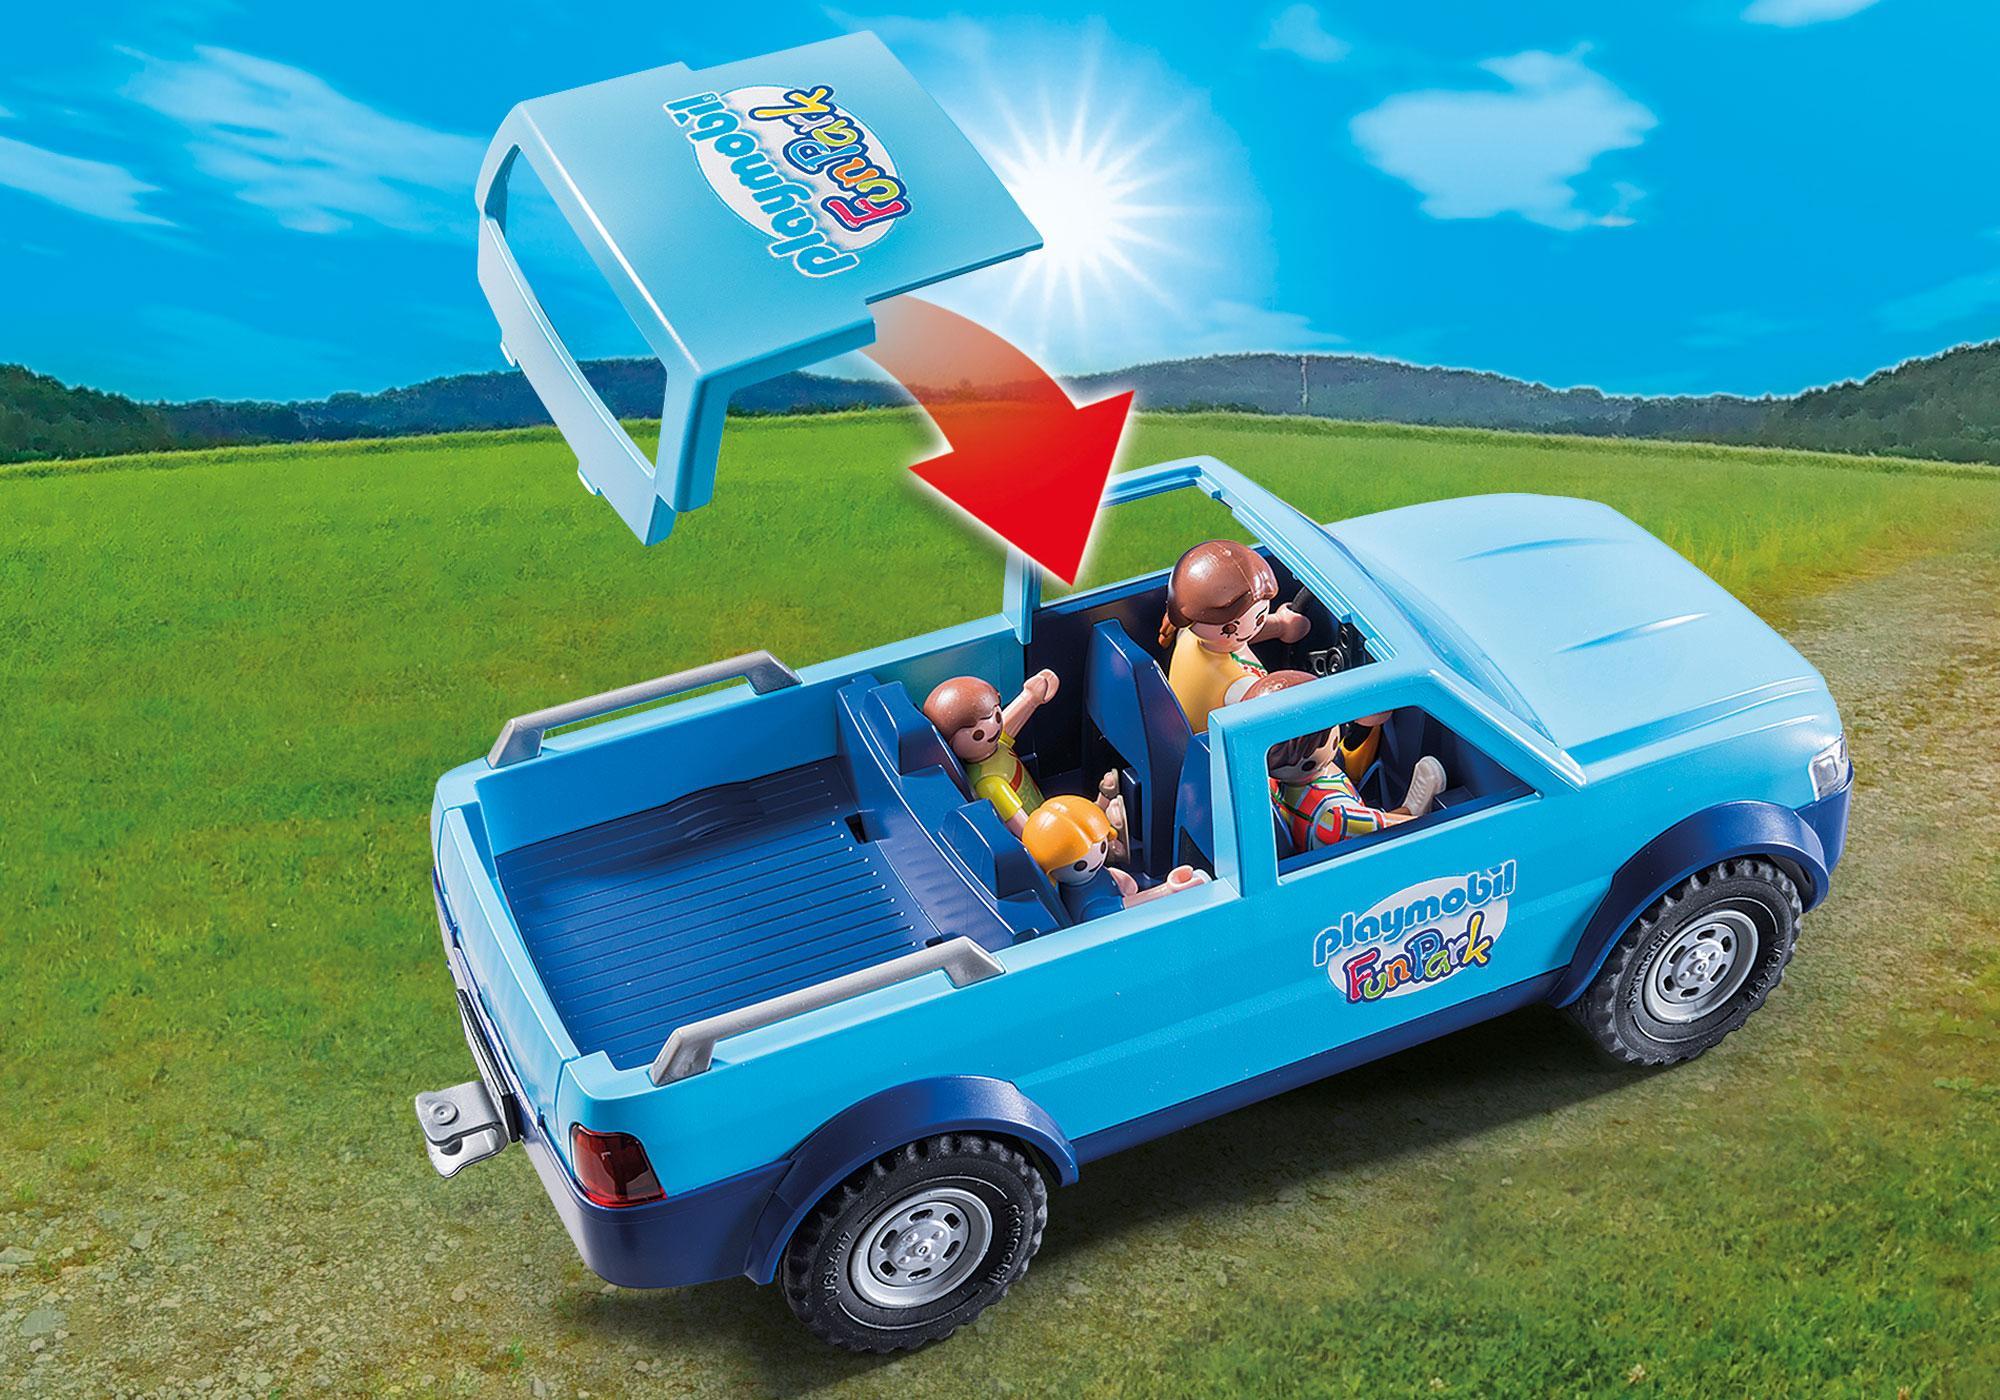 http://media.playmobil.com/i/playmobil/9502_product_extra1/PLAYMOBIL-FunPark Pickup met caravan